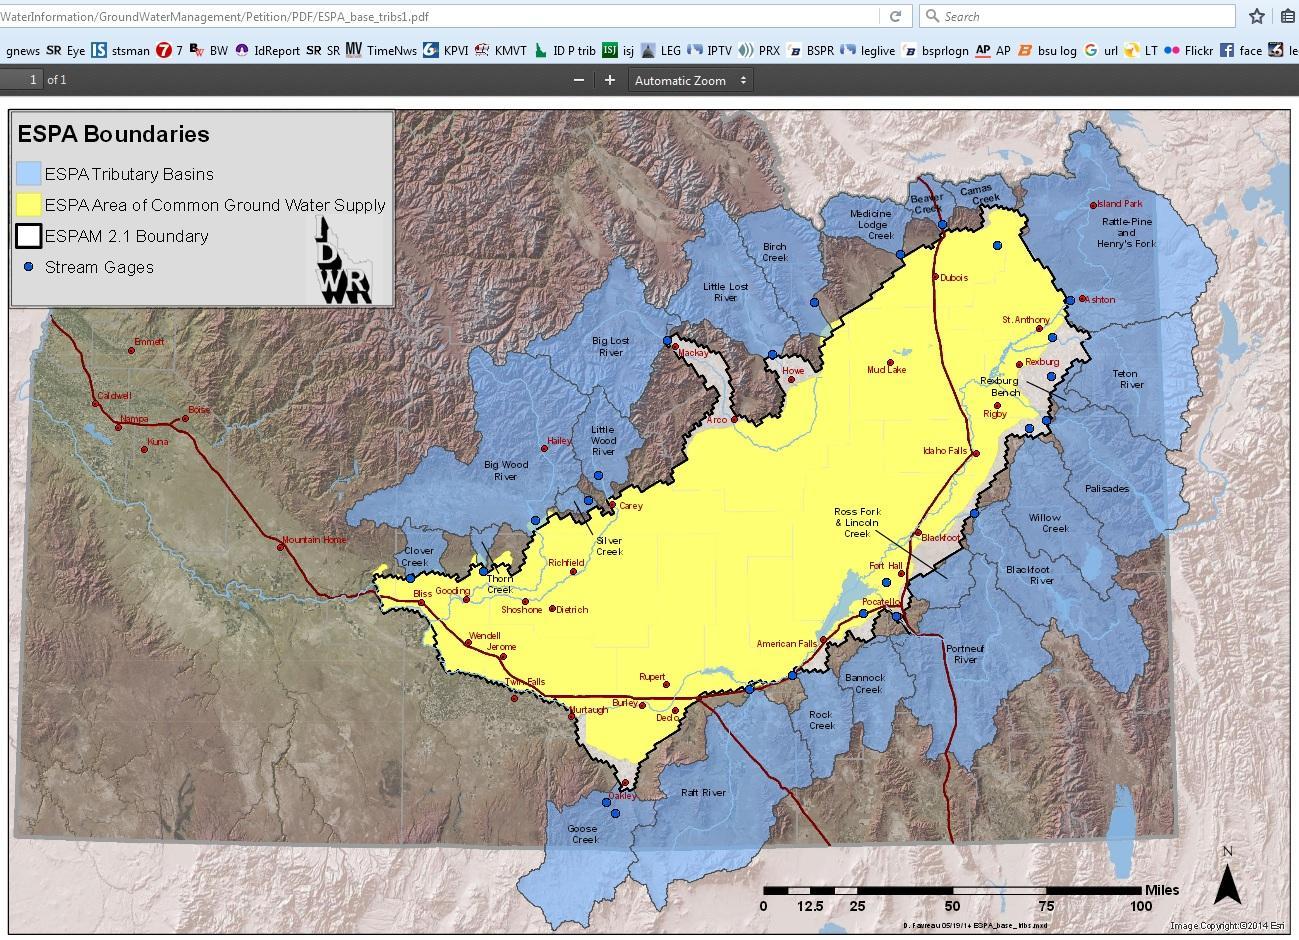 Watering Idaho The Snake River Plain Aquifer Boise State Public Radio - Aquifer-map-us